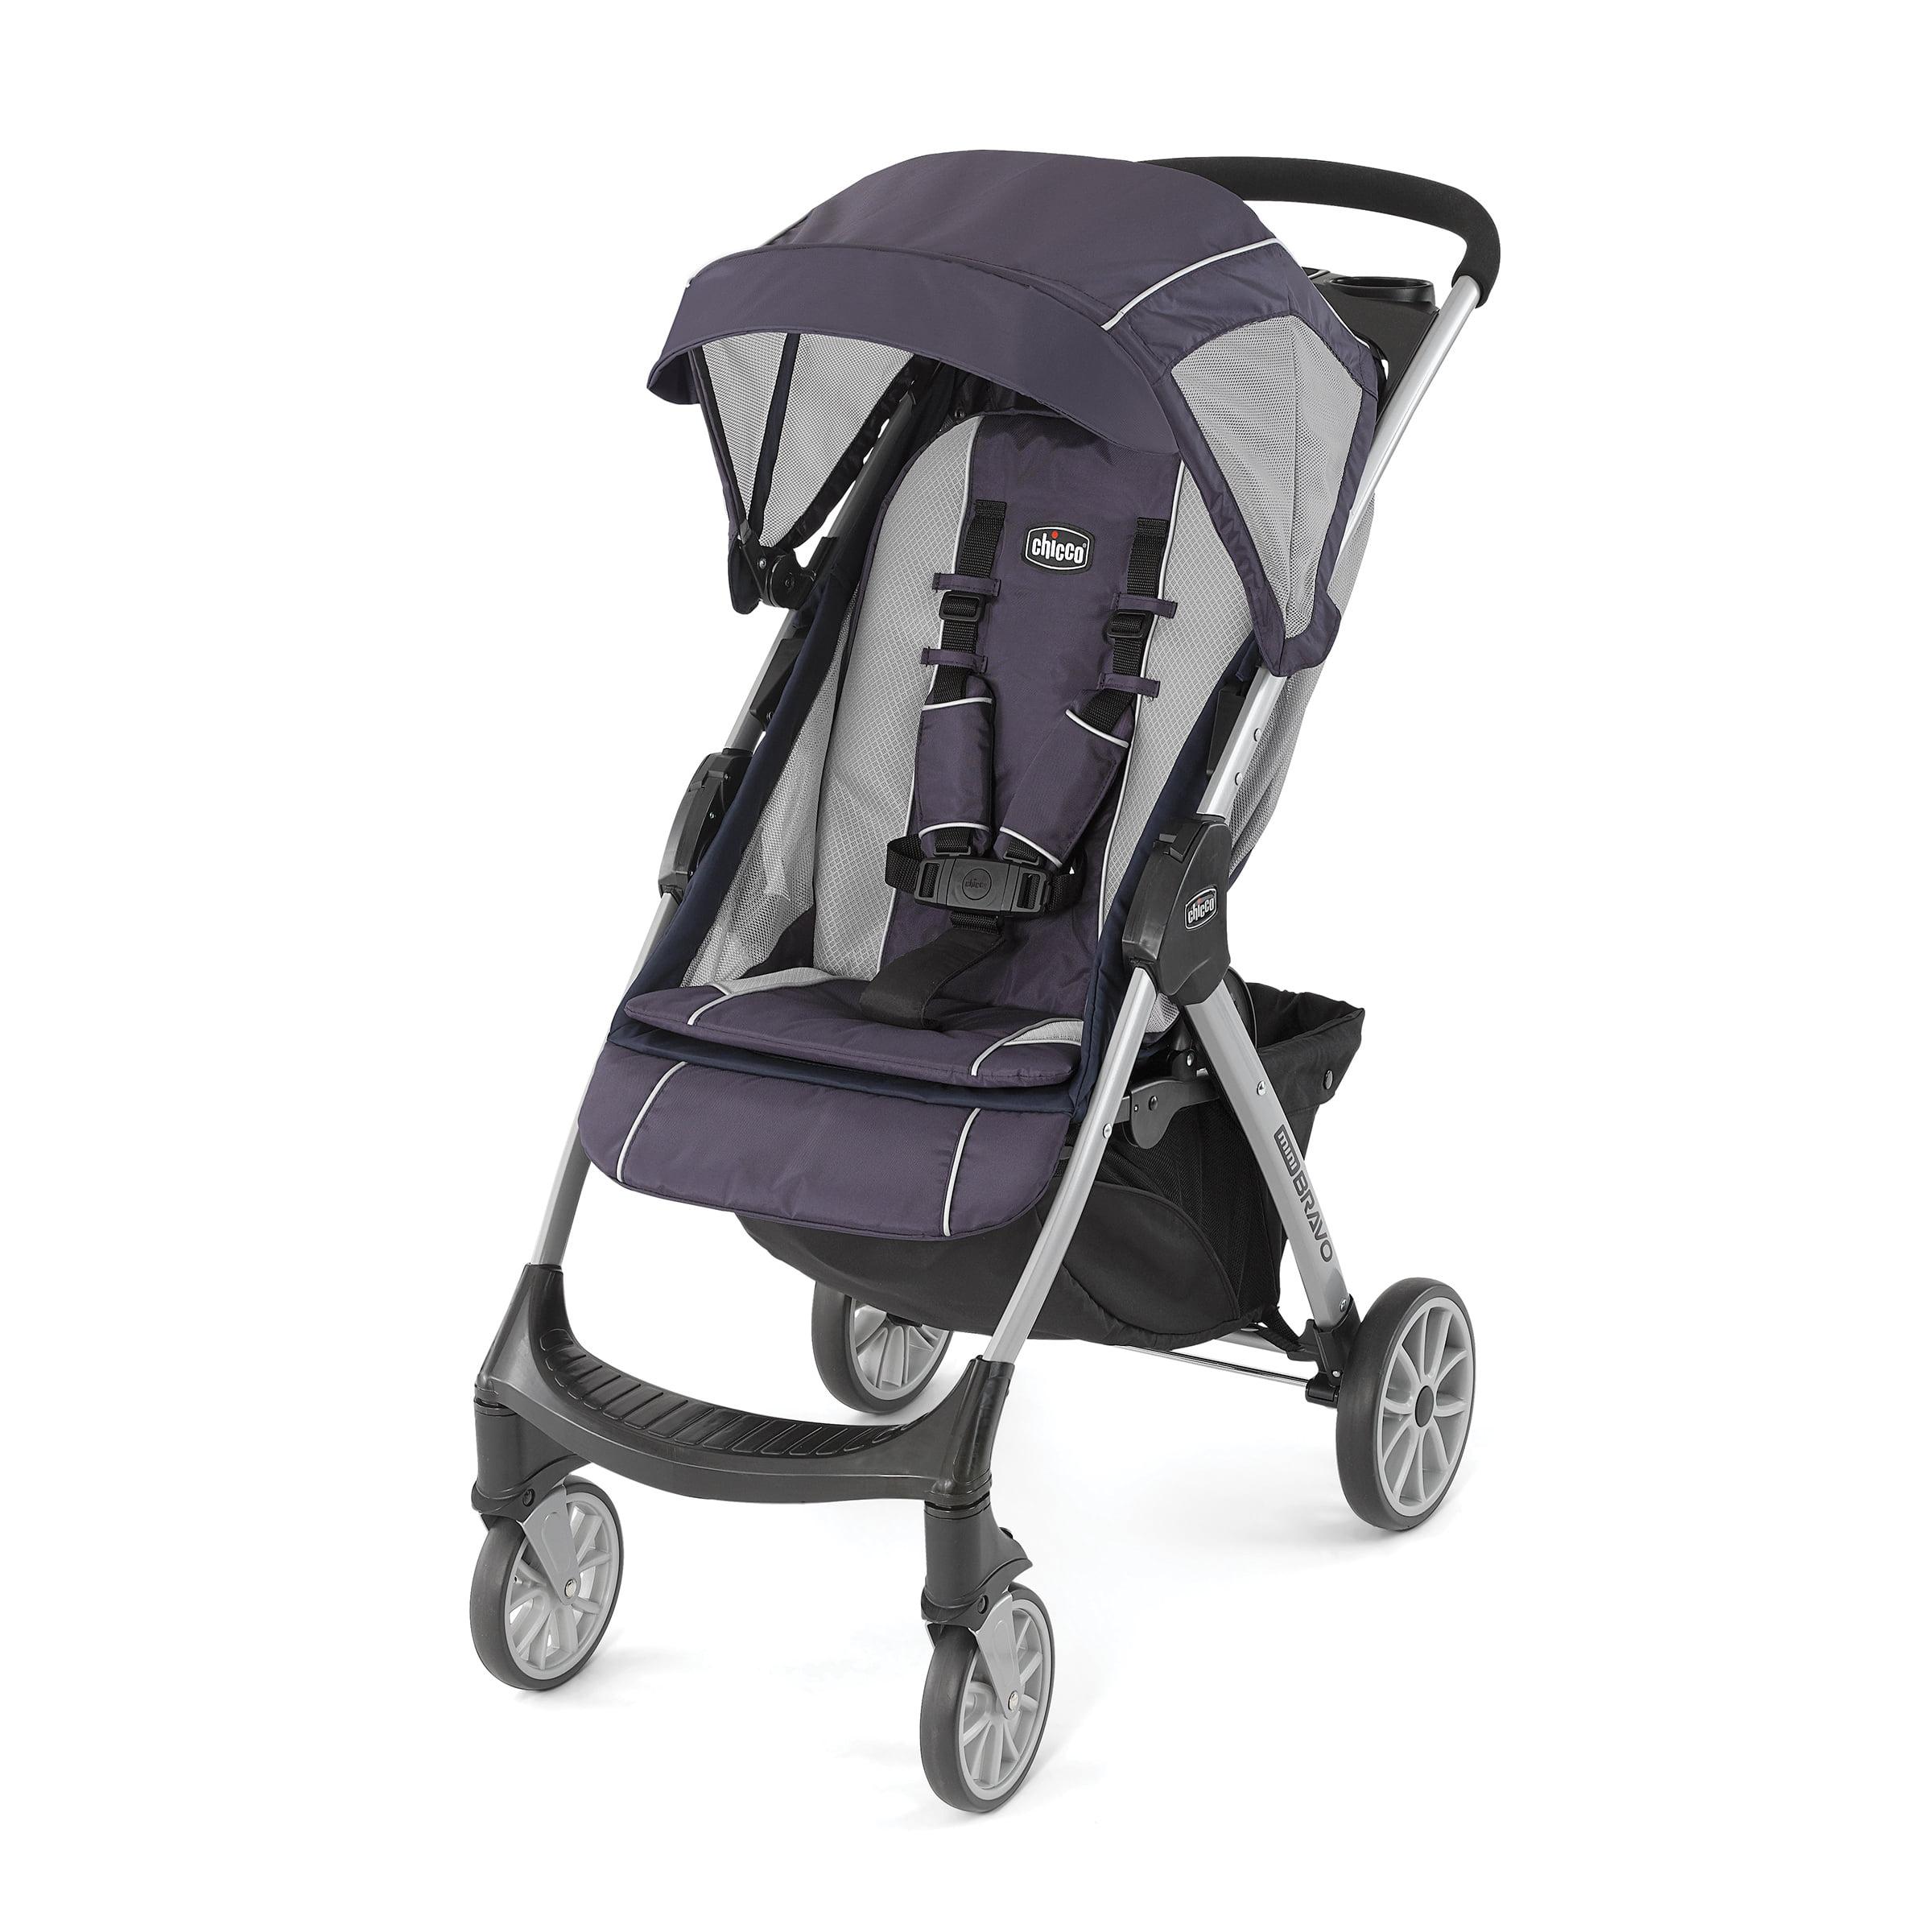 Chicco Mini Bravo Lightweight Stroller - Mulberry